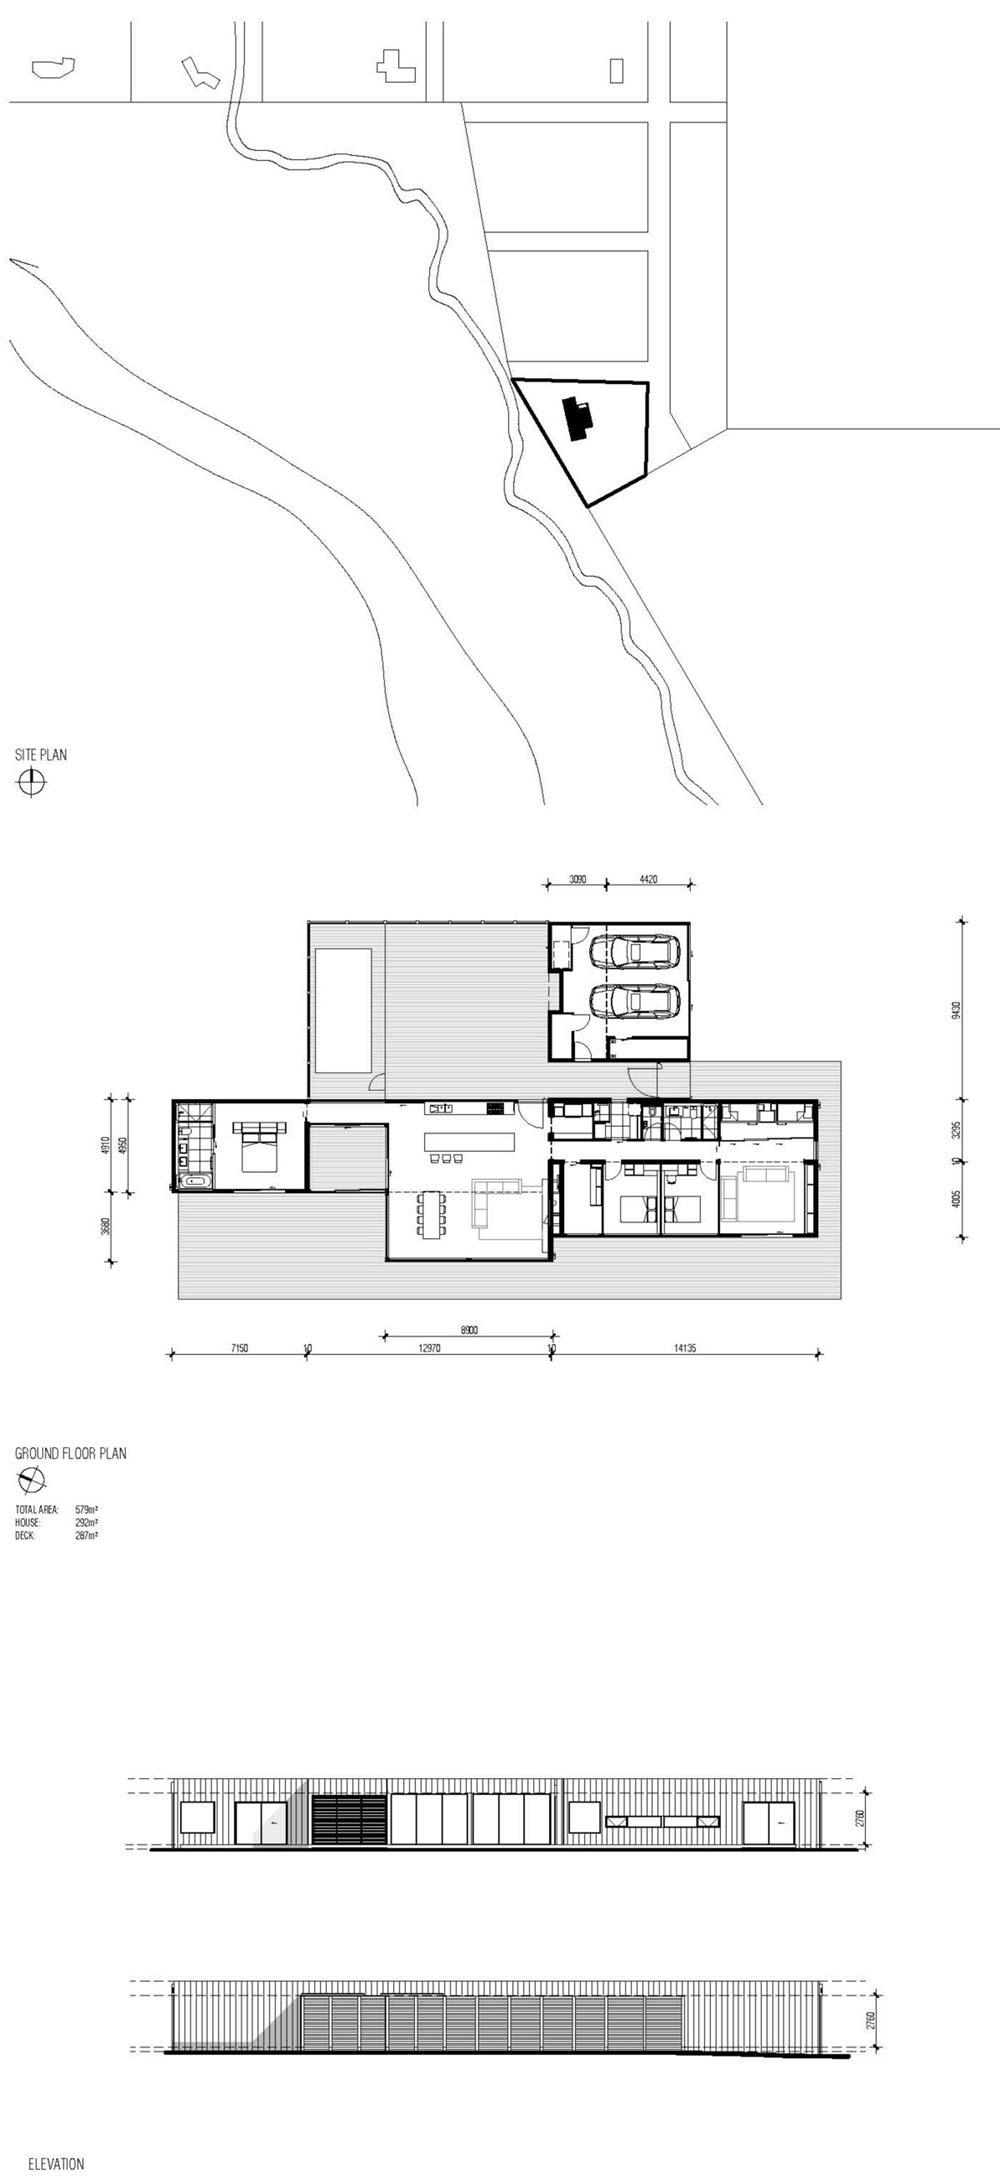 modern modular home plan ms - Phillip Island Modular Home